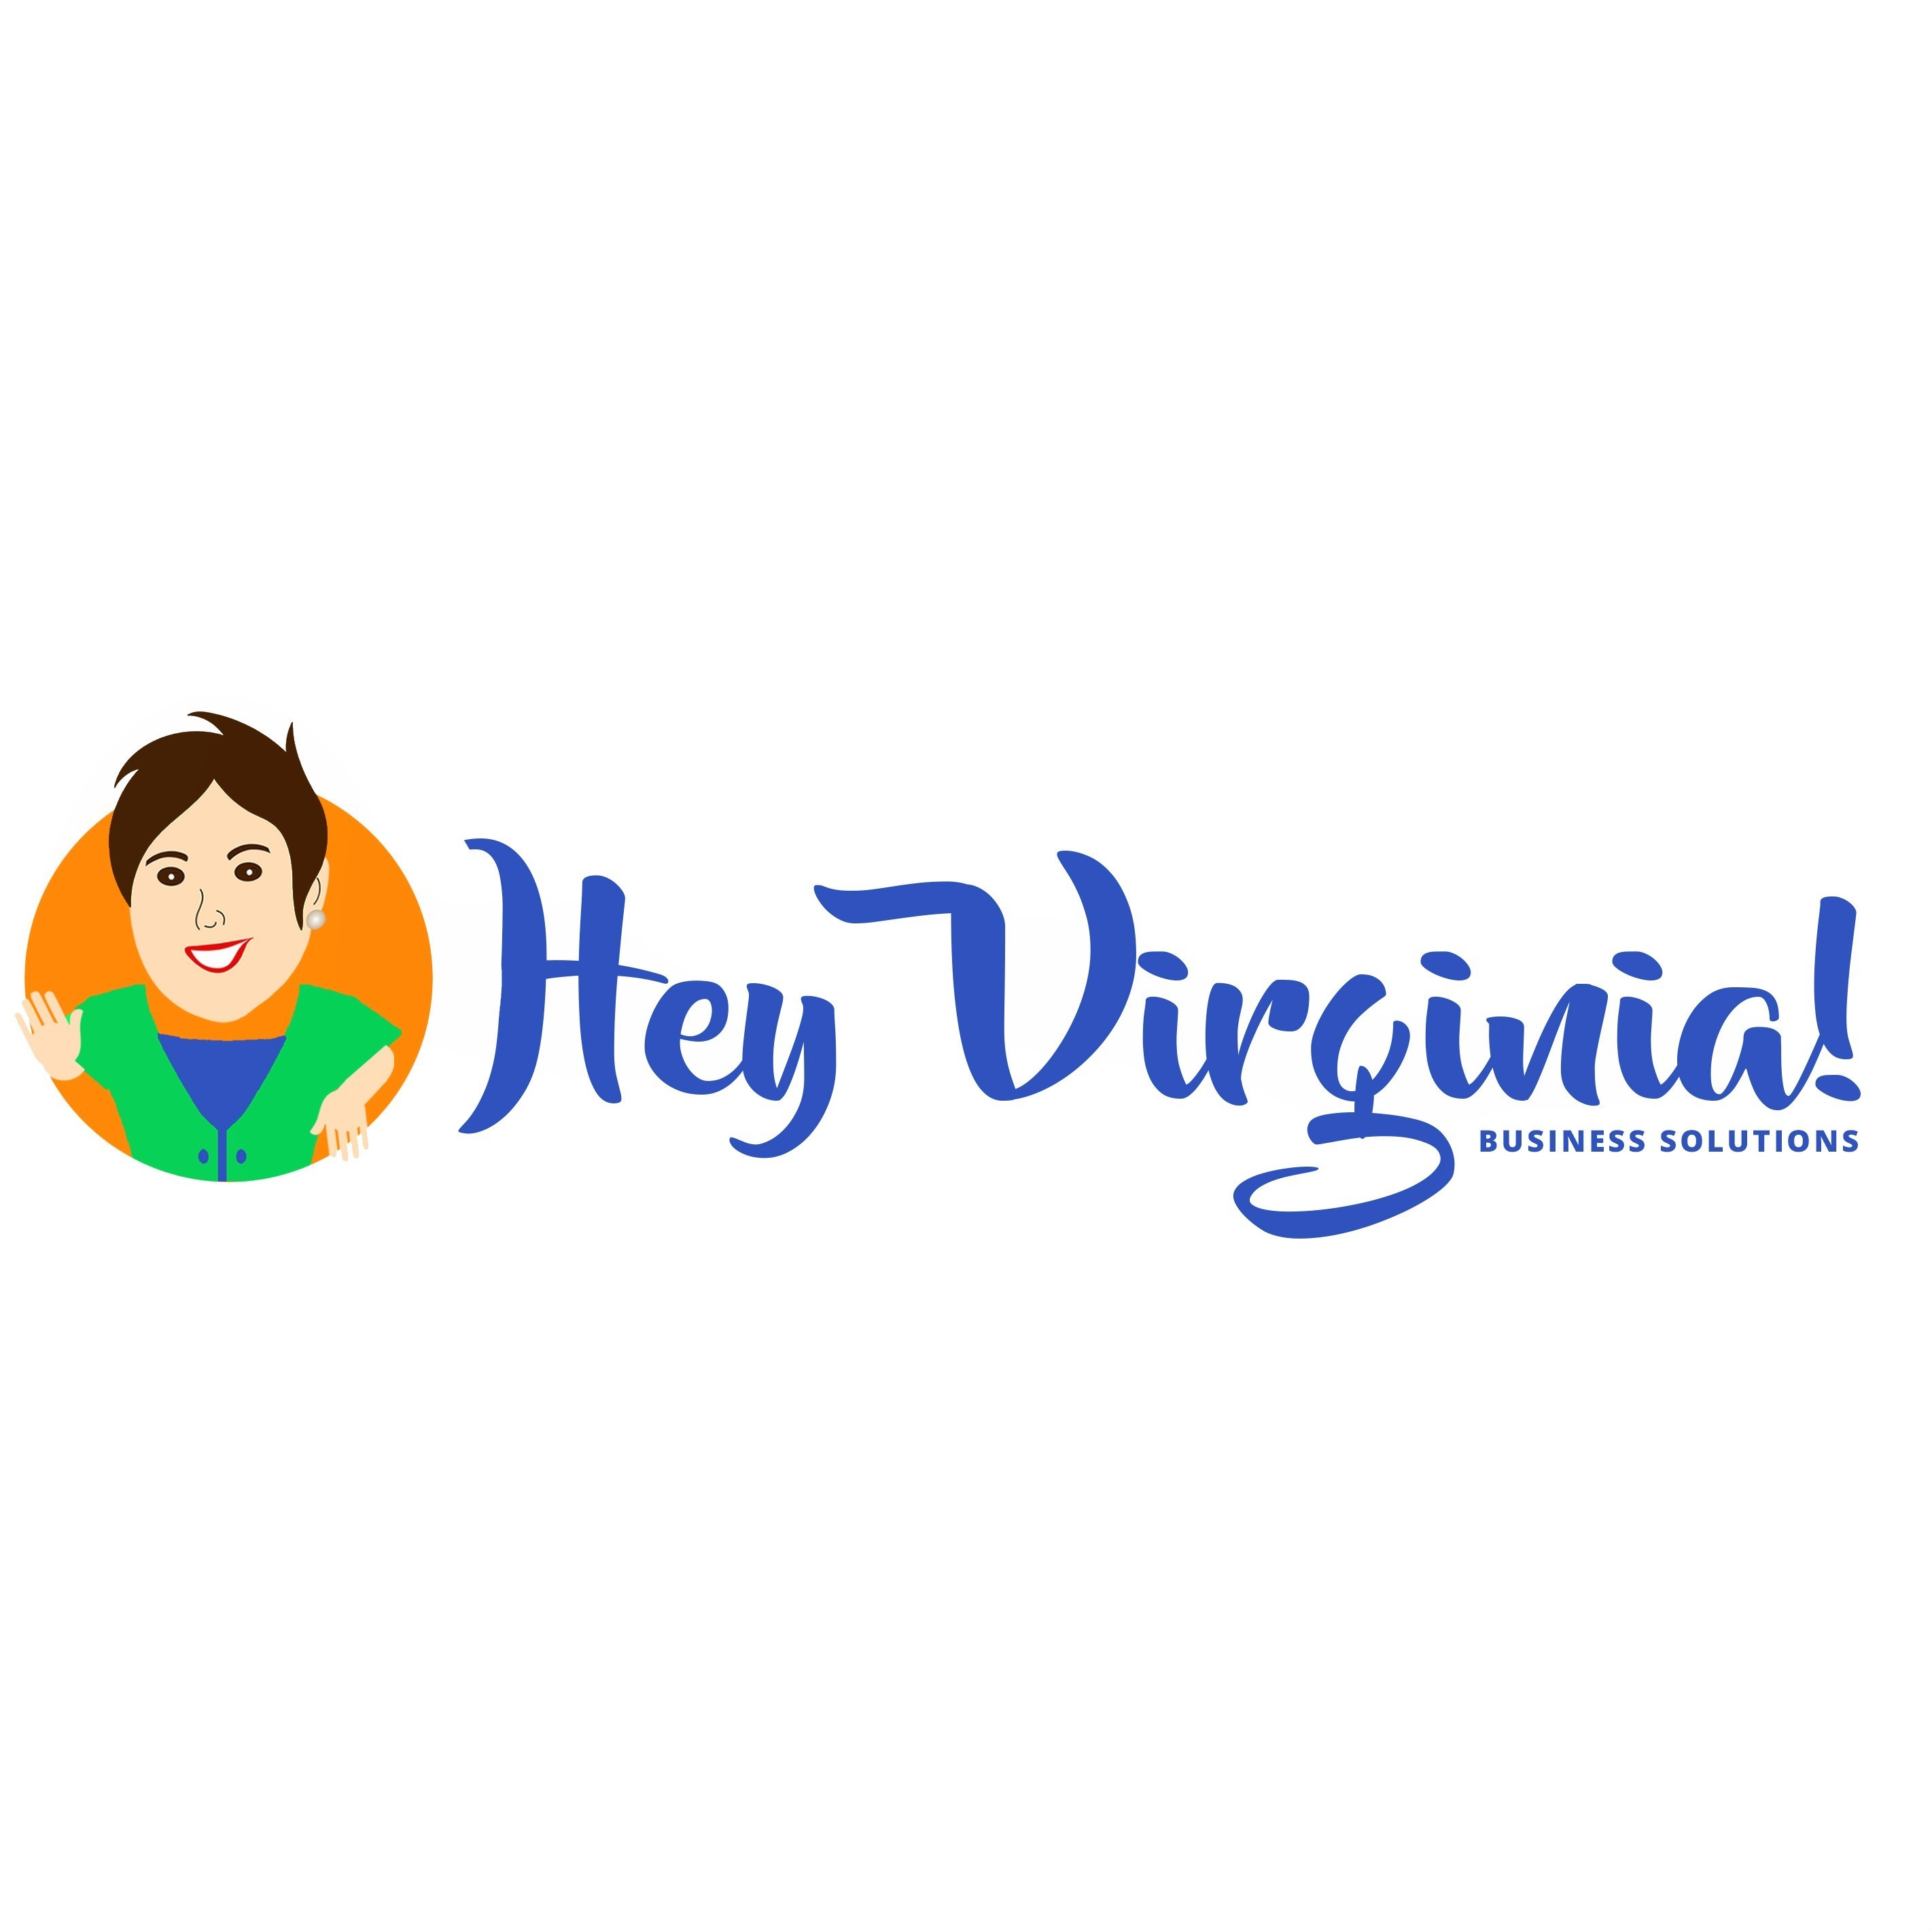 Hey Virginia! Business Solutions LLC